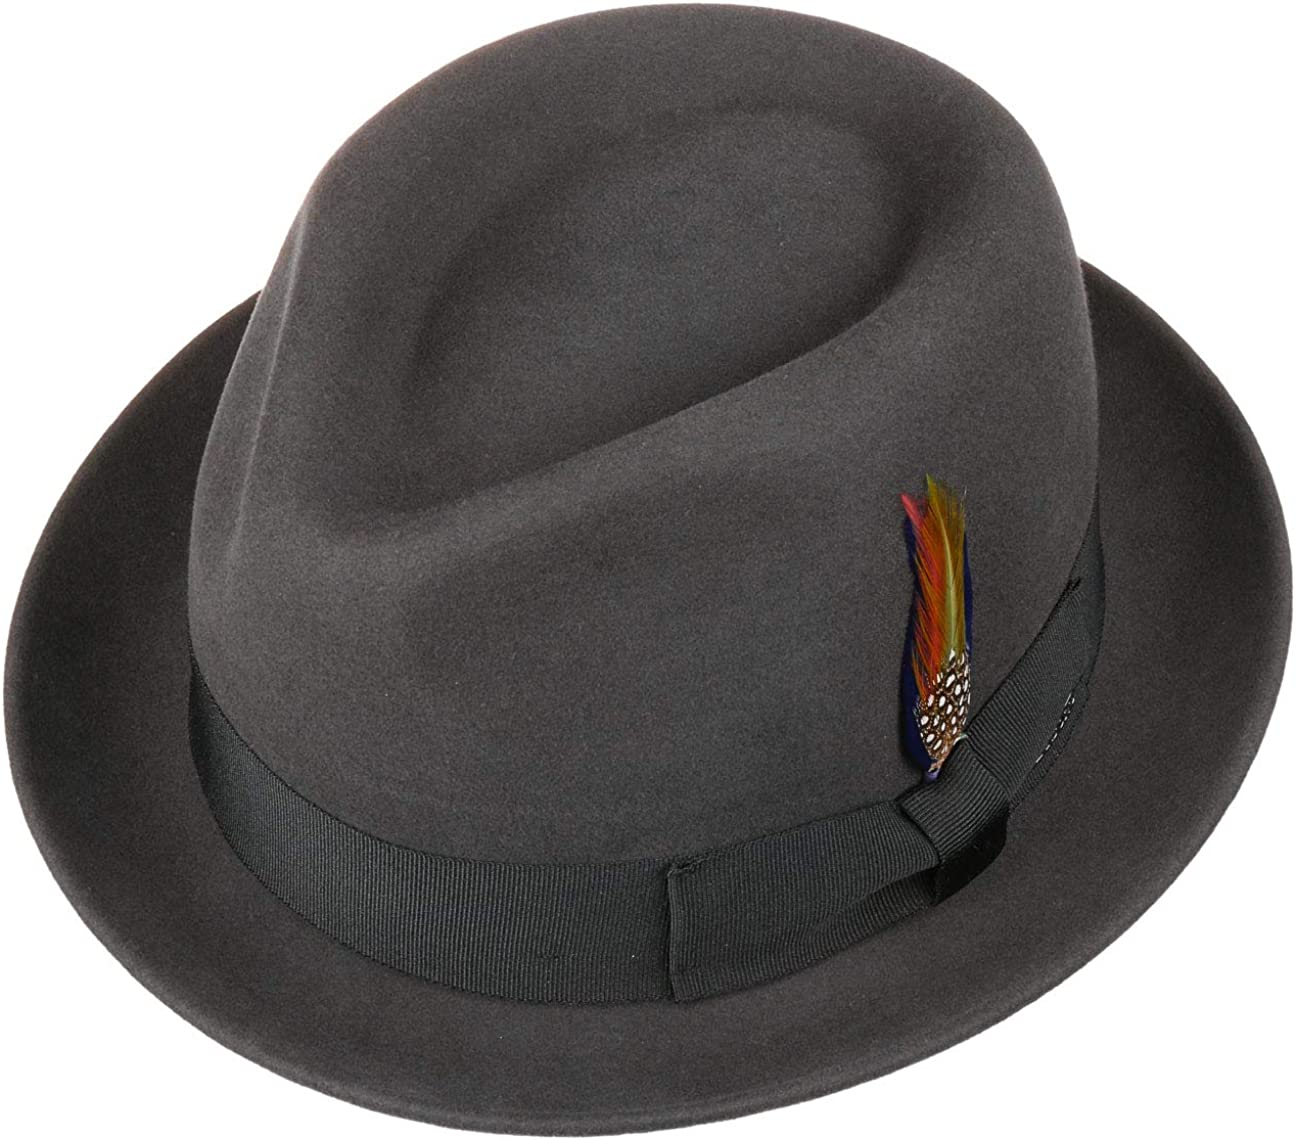 Felt Fedora Musician/´s with Grosgrain Band Autumn-Winter Stetson Wool /& Cashmere Player Hat Men